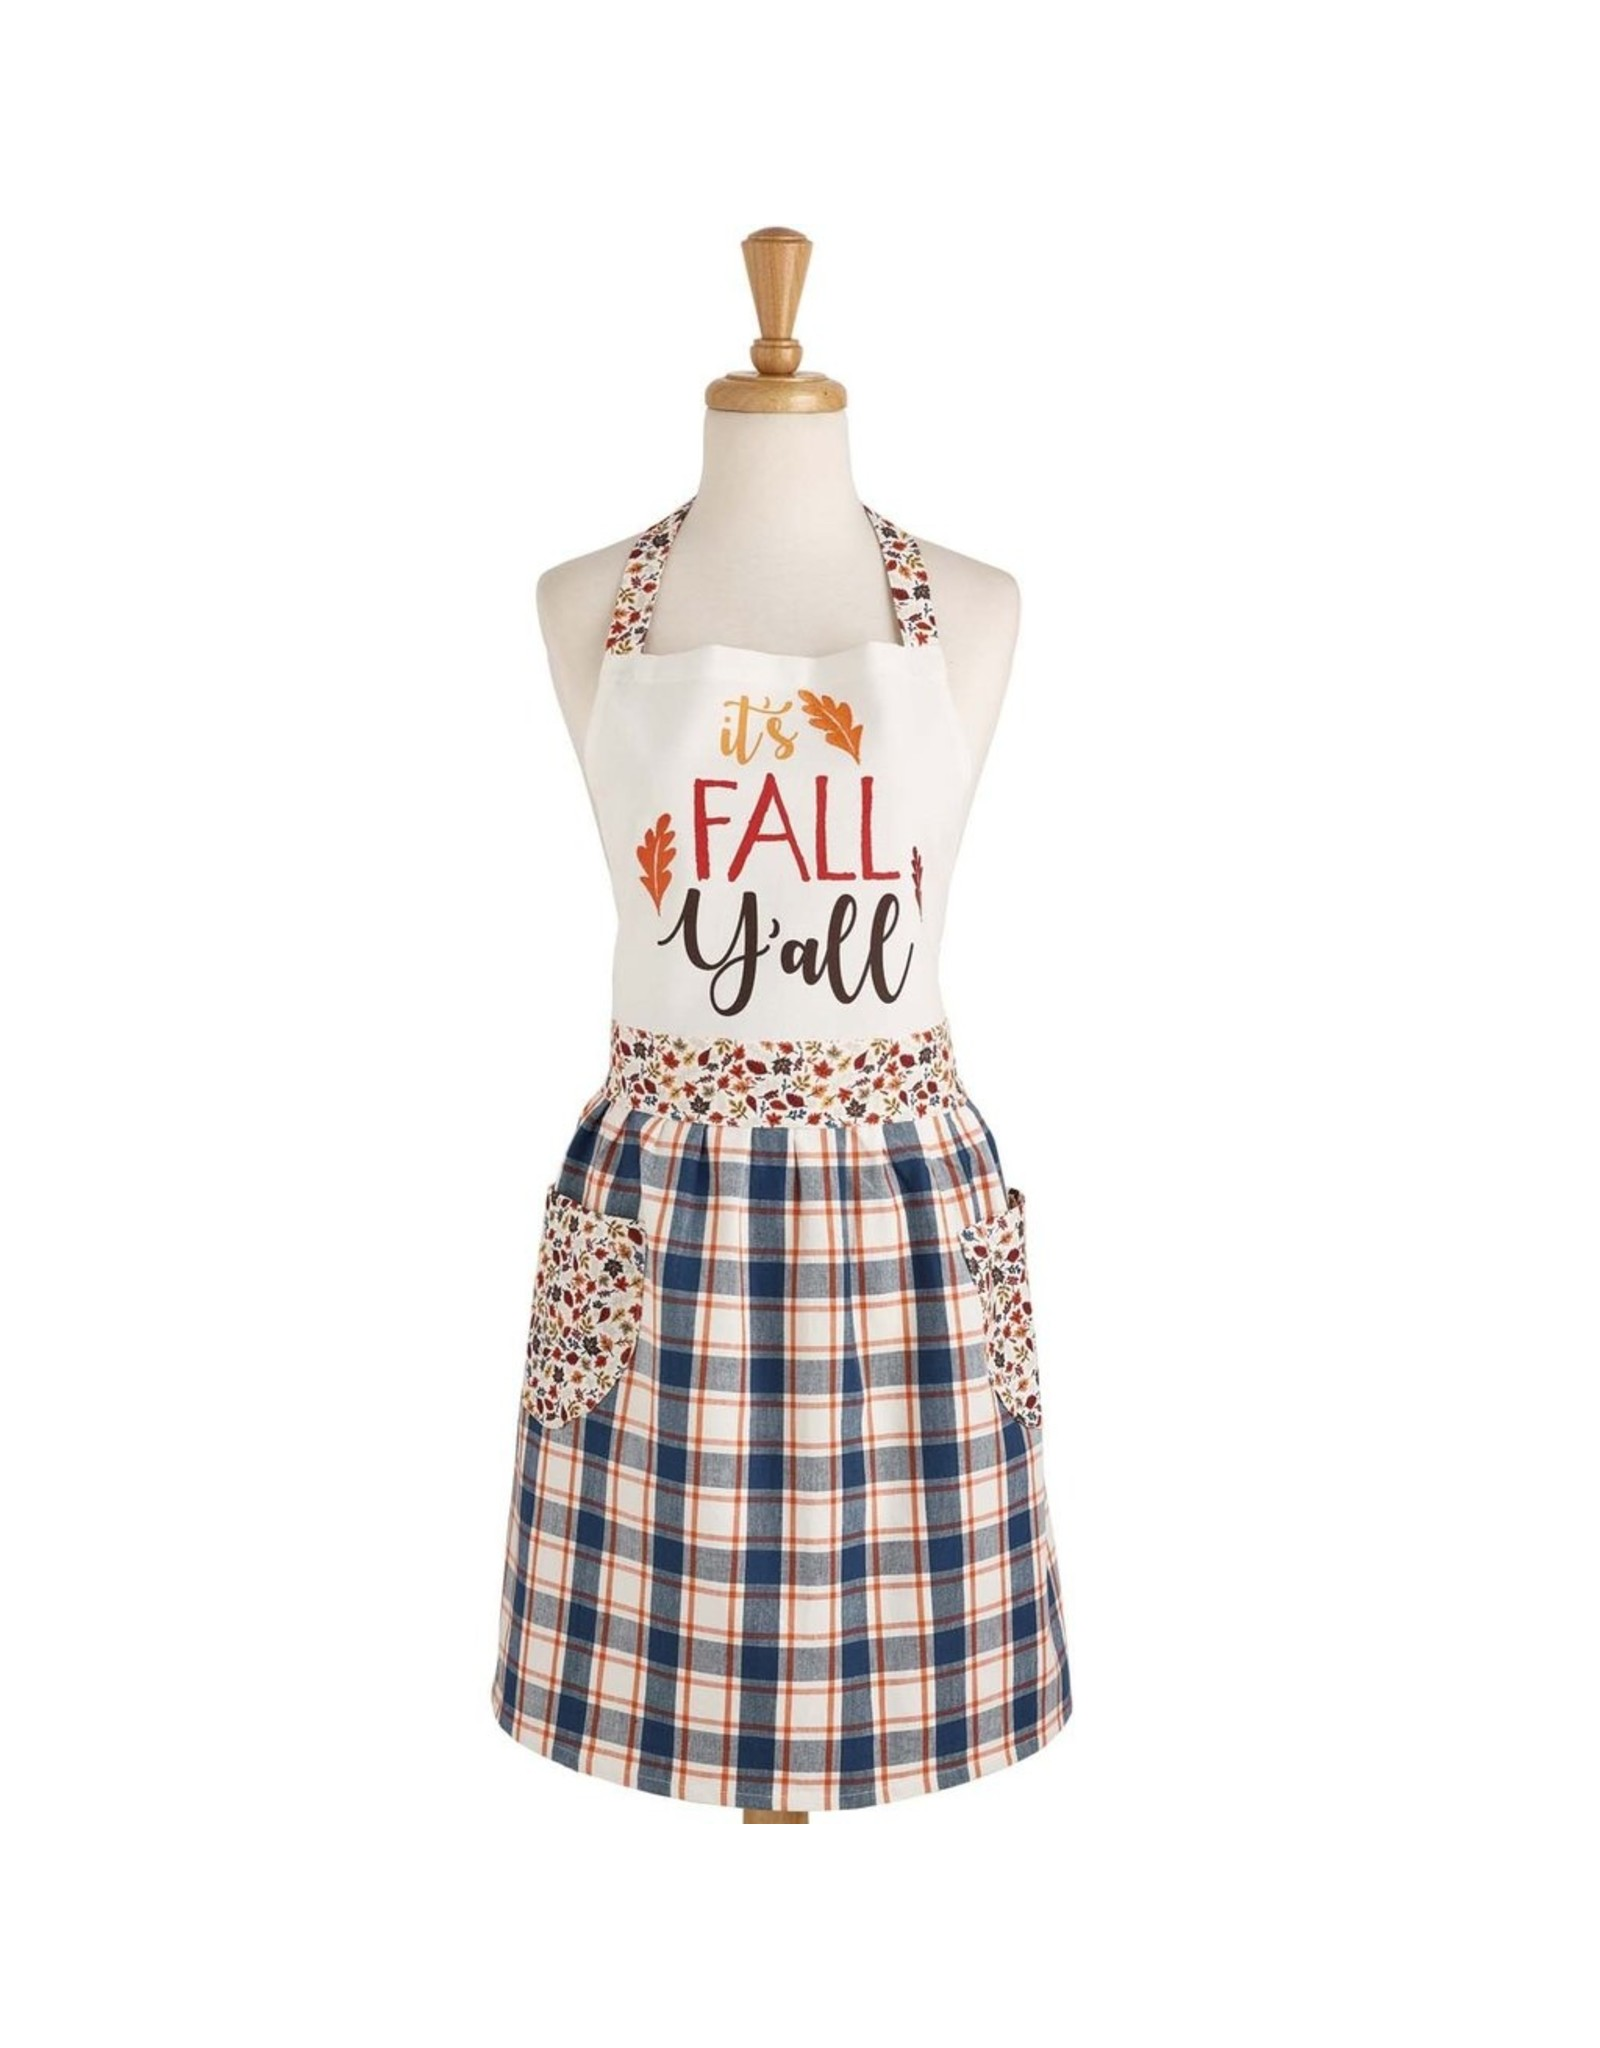 It's Fall Y'all - Apron